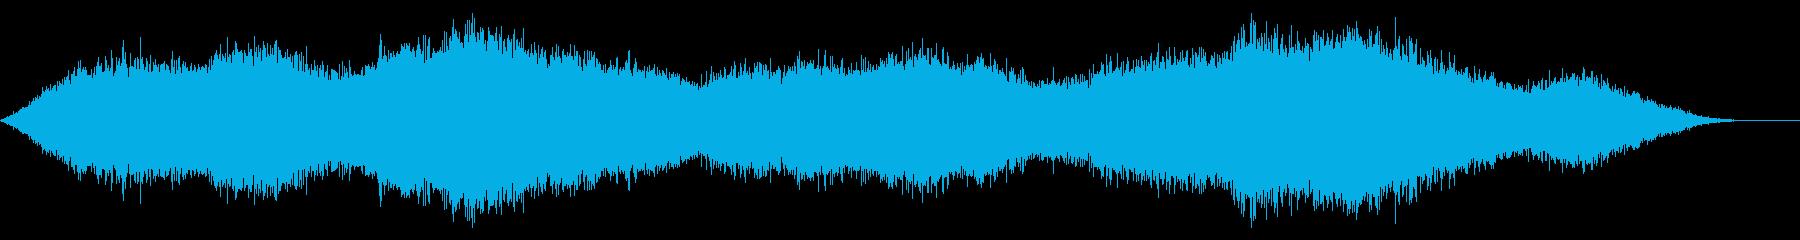 drone19の再生済みの波形